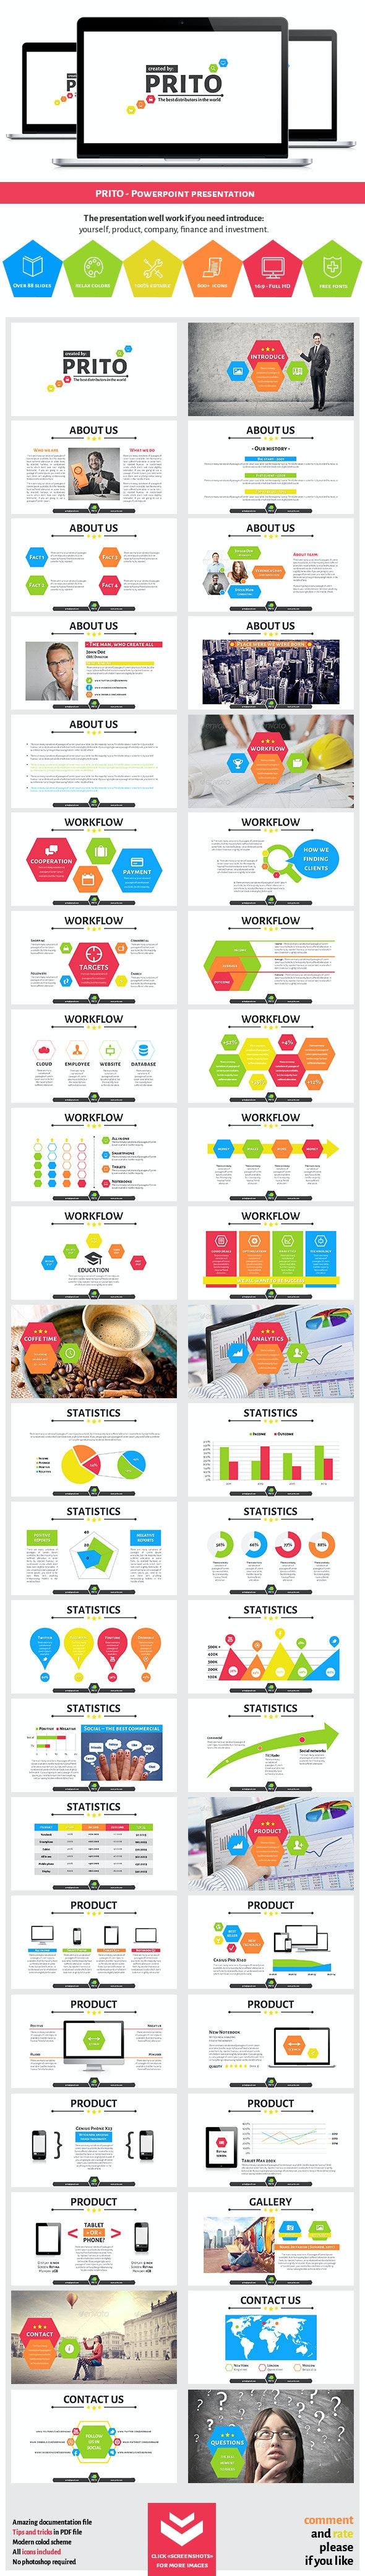 Prito Powerpoint Presentation - Business PowerPoint Templates